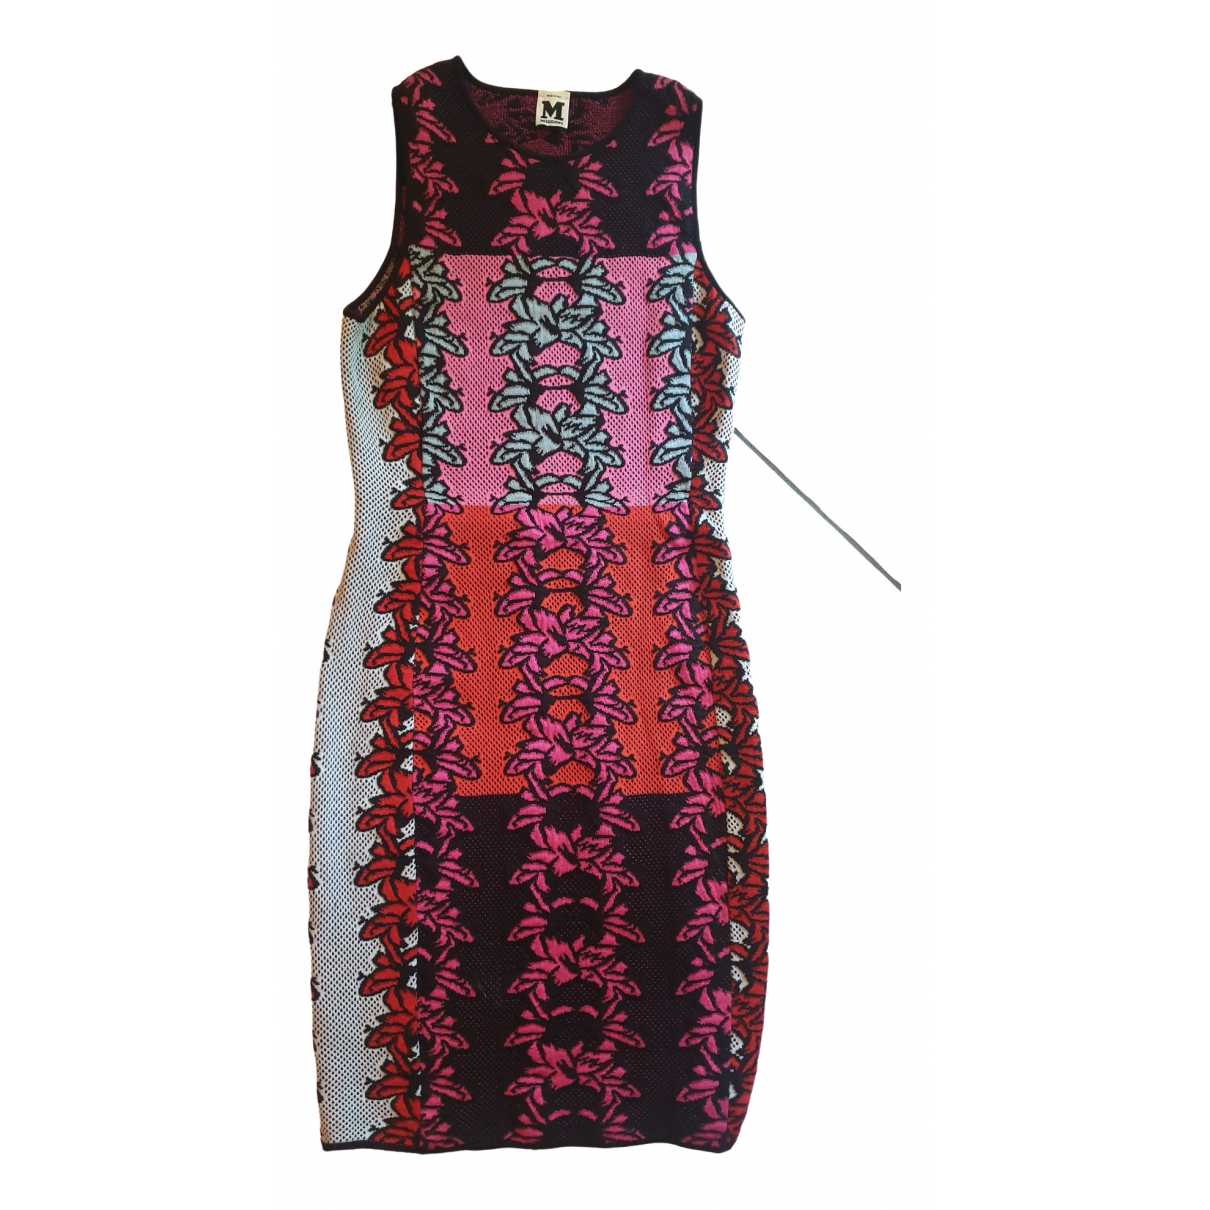 M Missoni \N Multicolour dress for Women 38 IT